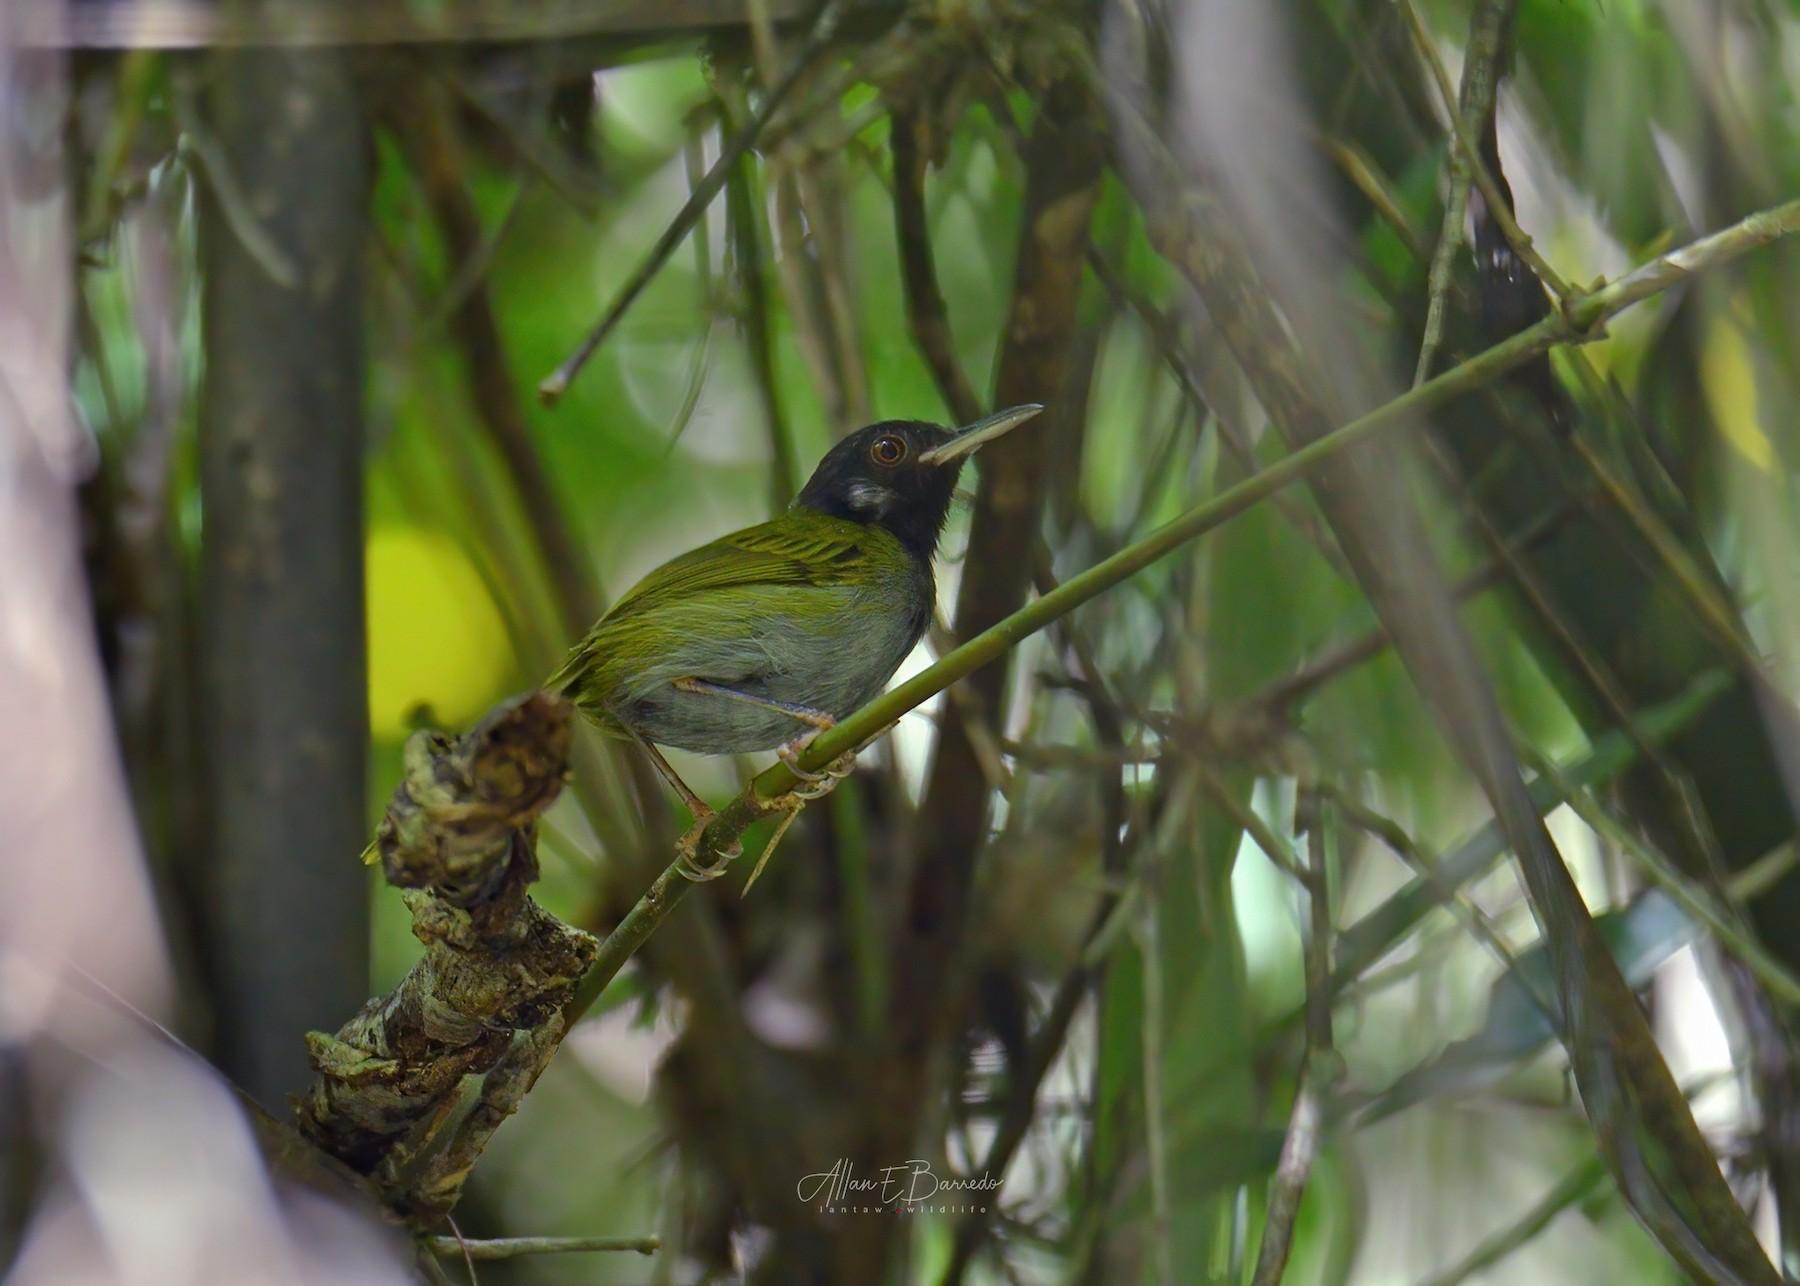 White-eared Tailorbird - Allan Barredo